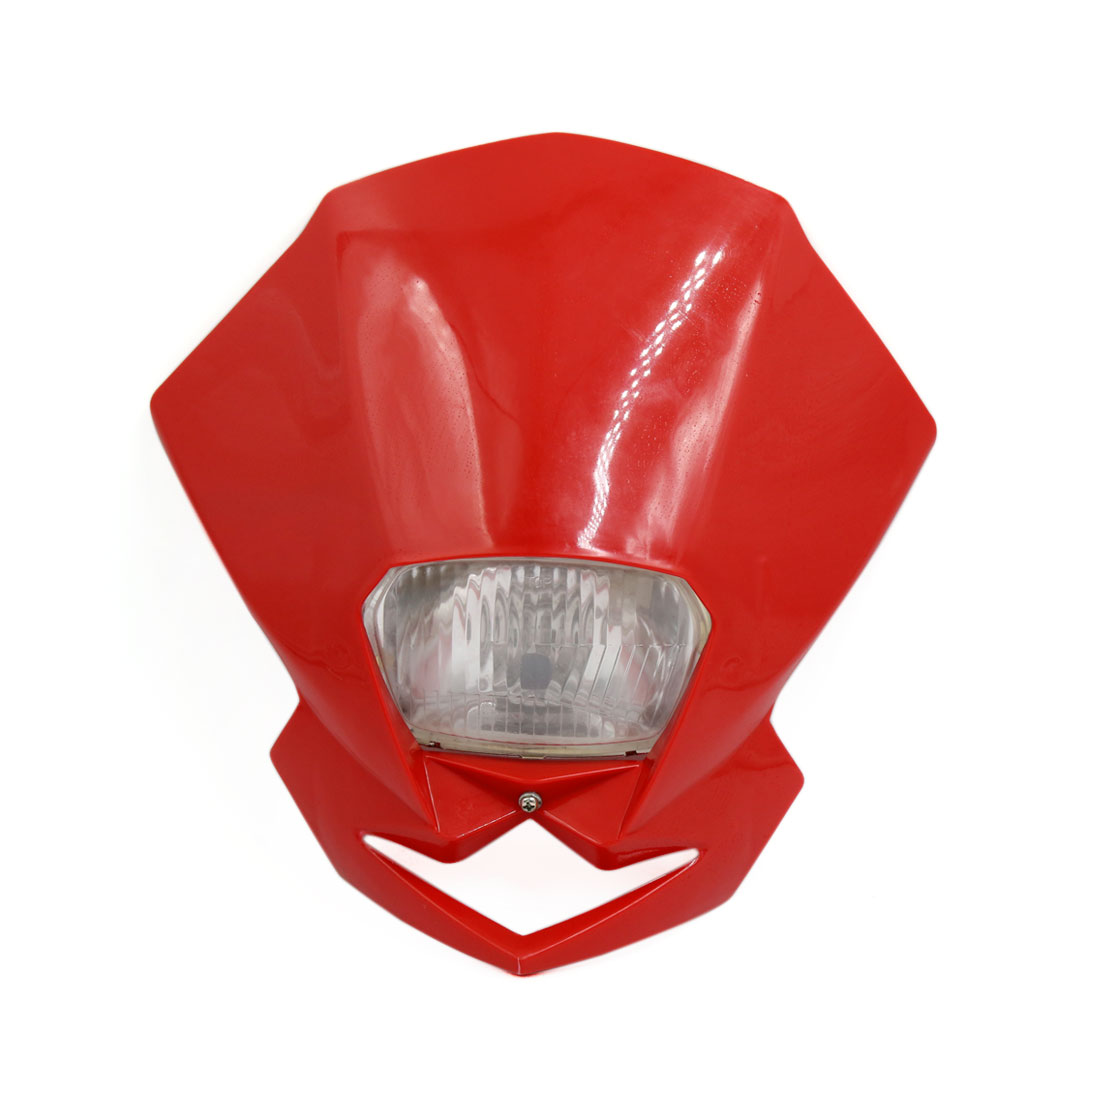 Universal Red Case Motorcycle Street Fighter Headlight Fairing Light Lamp Yellow